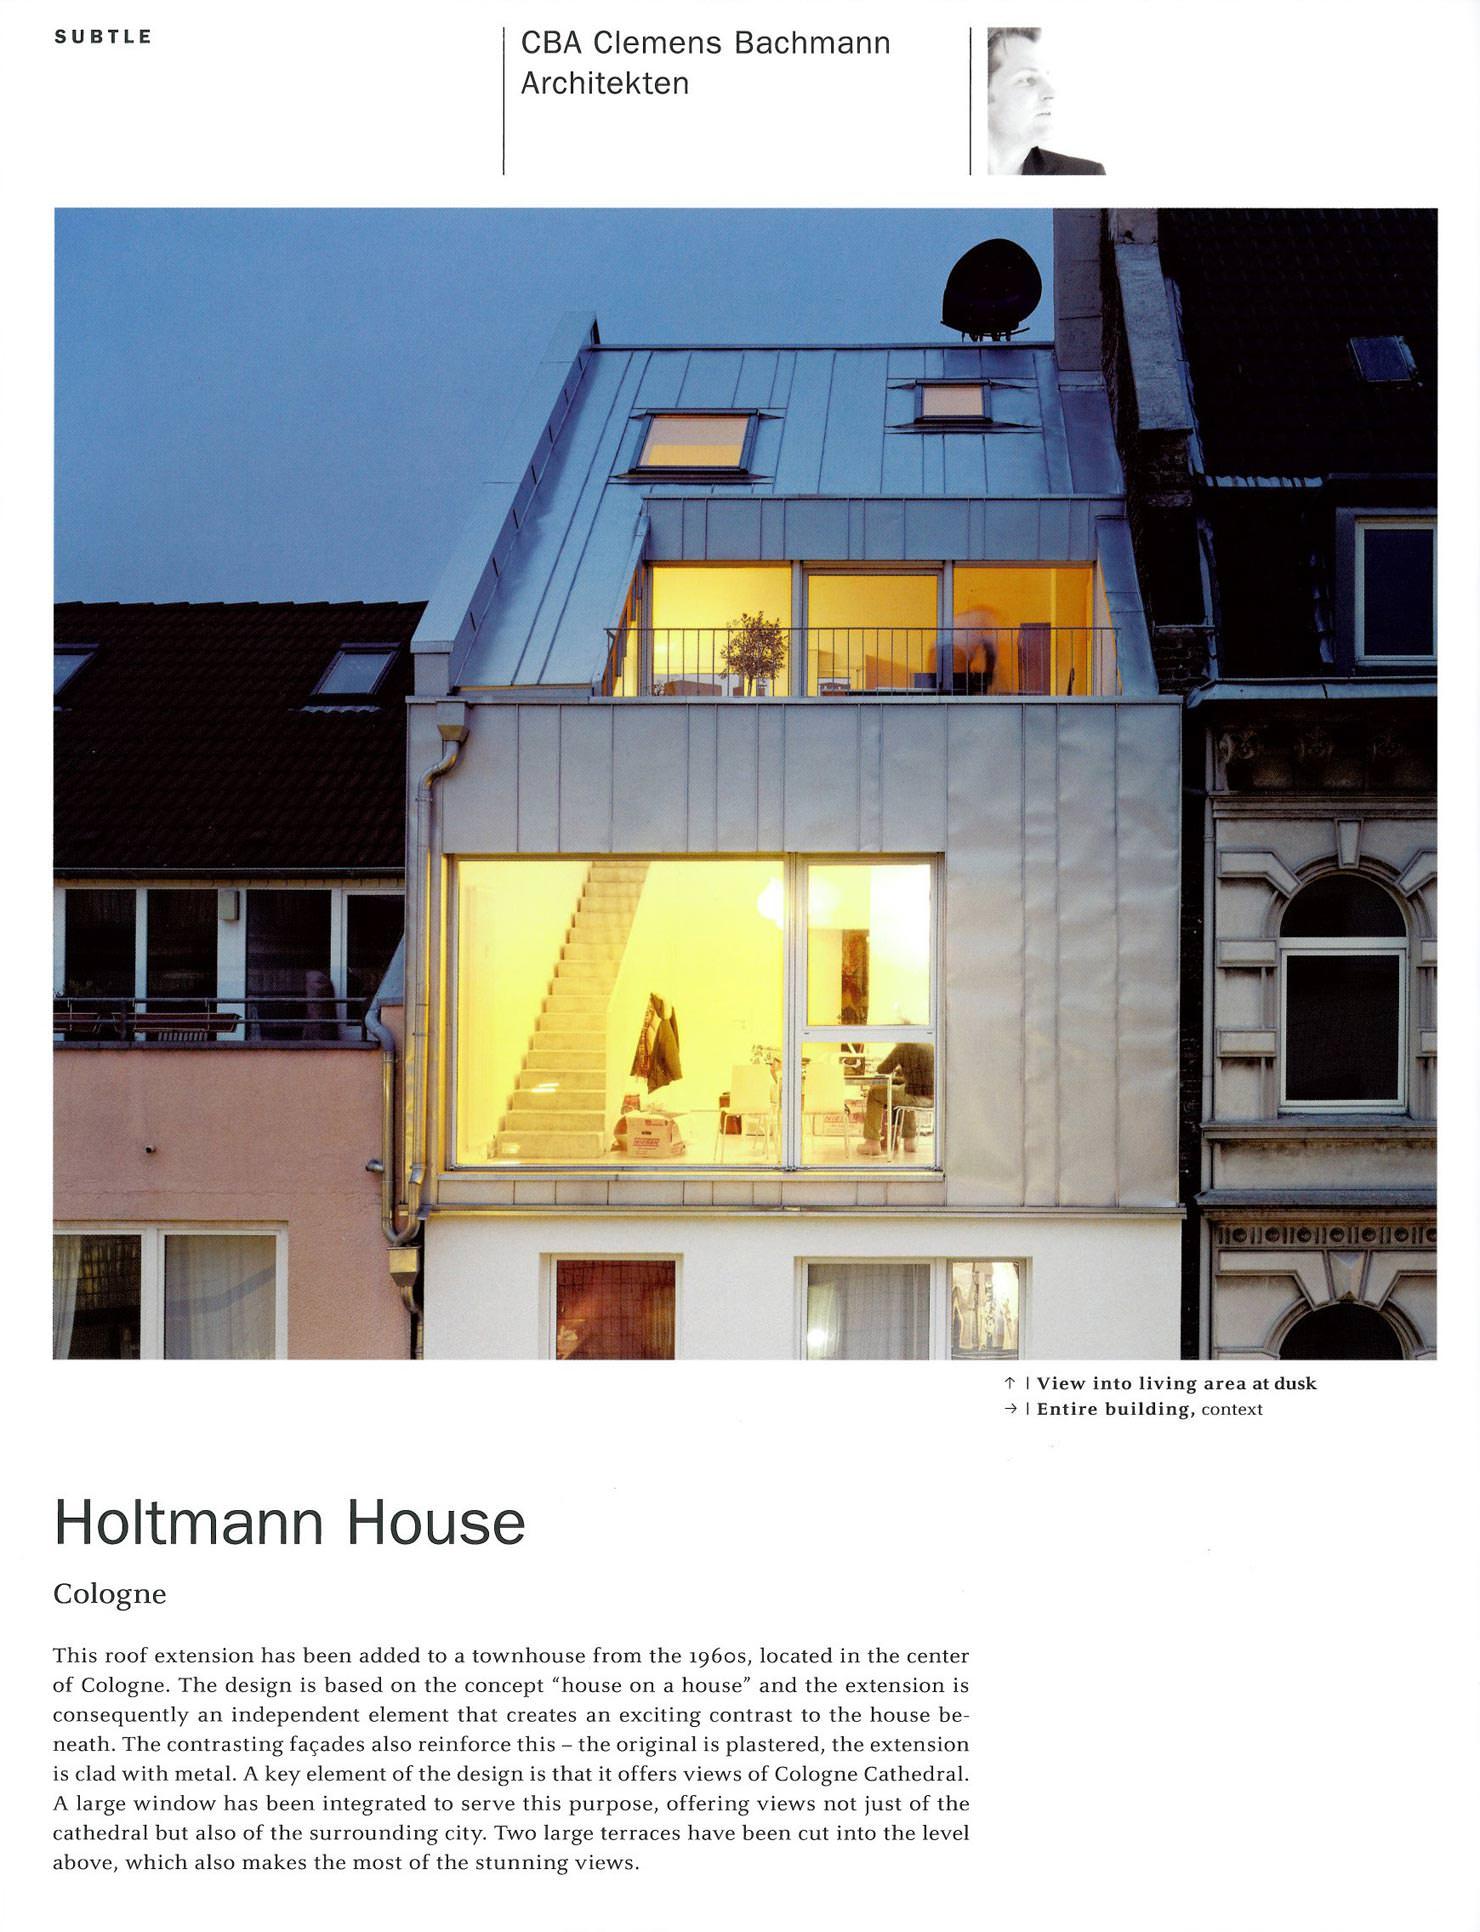 Townhouse design haus holtmann cba clemens bachmann for Design haus